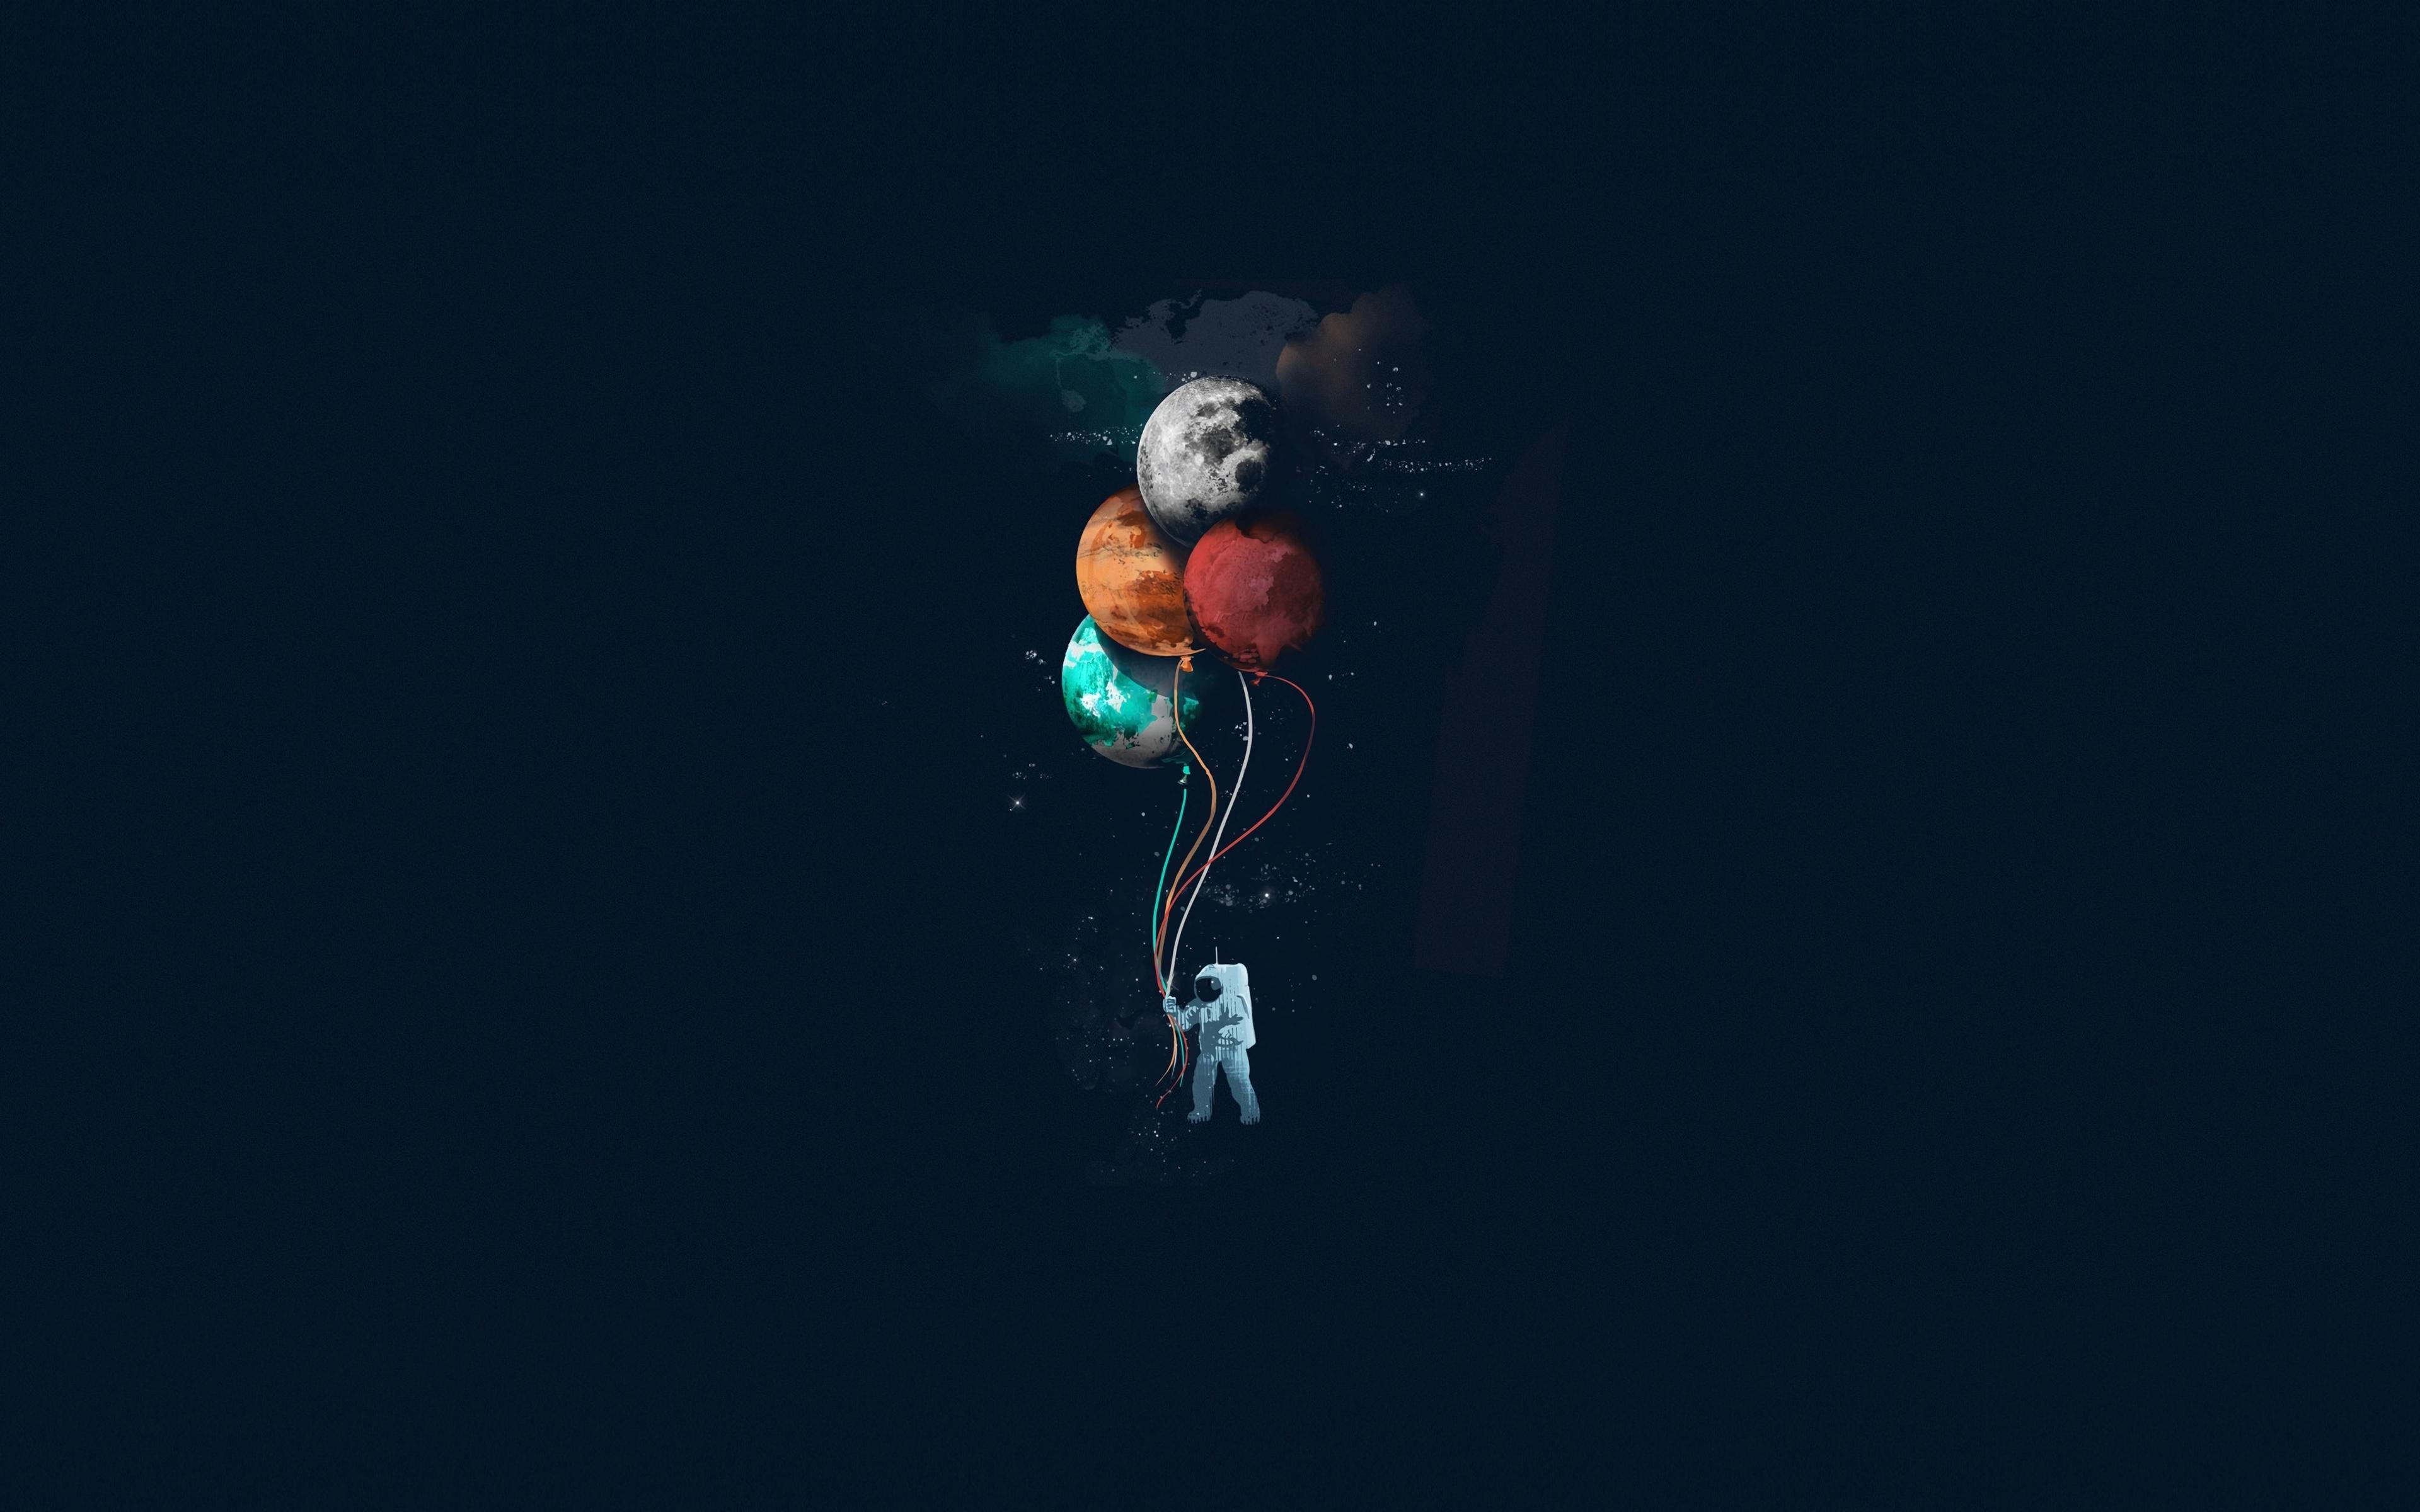 Download 3840x2400 Wallpaper Astronaut Balloons Space Minimal Art 4k Ultra Hd 16 10 Widescreen 3840x2400 Hd Image Background 22187